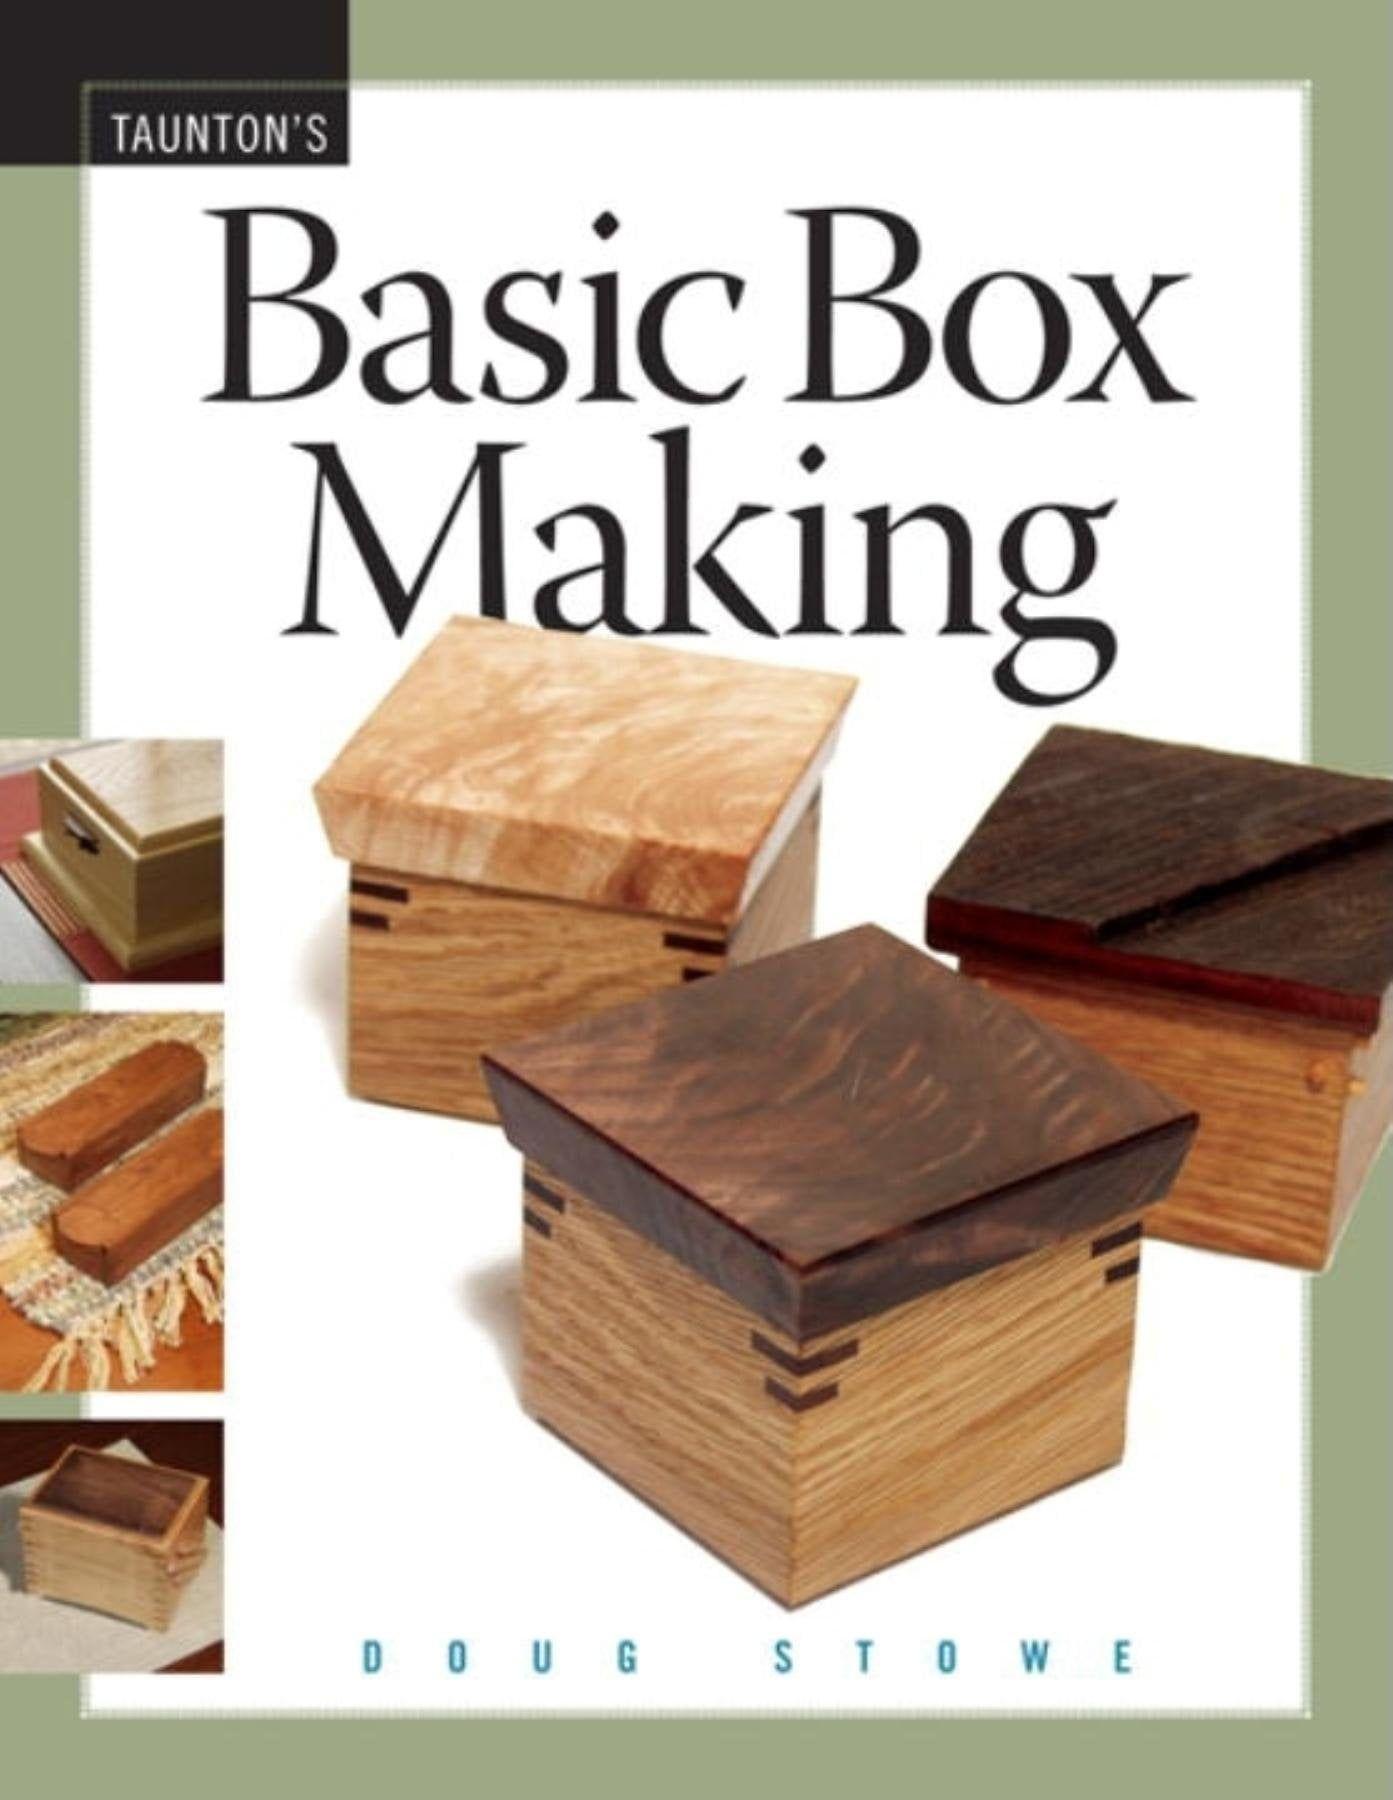 Taunton's Basic Box Making Book By Doug Stowe